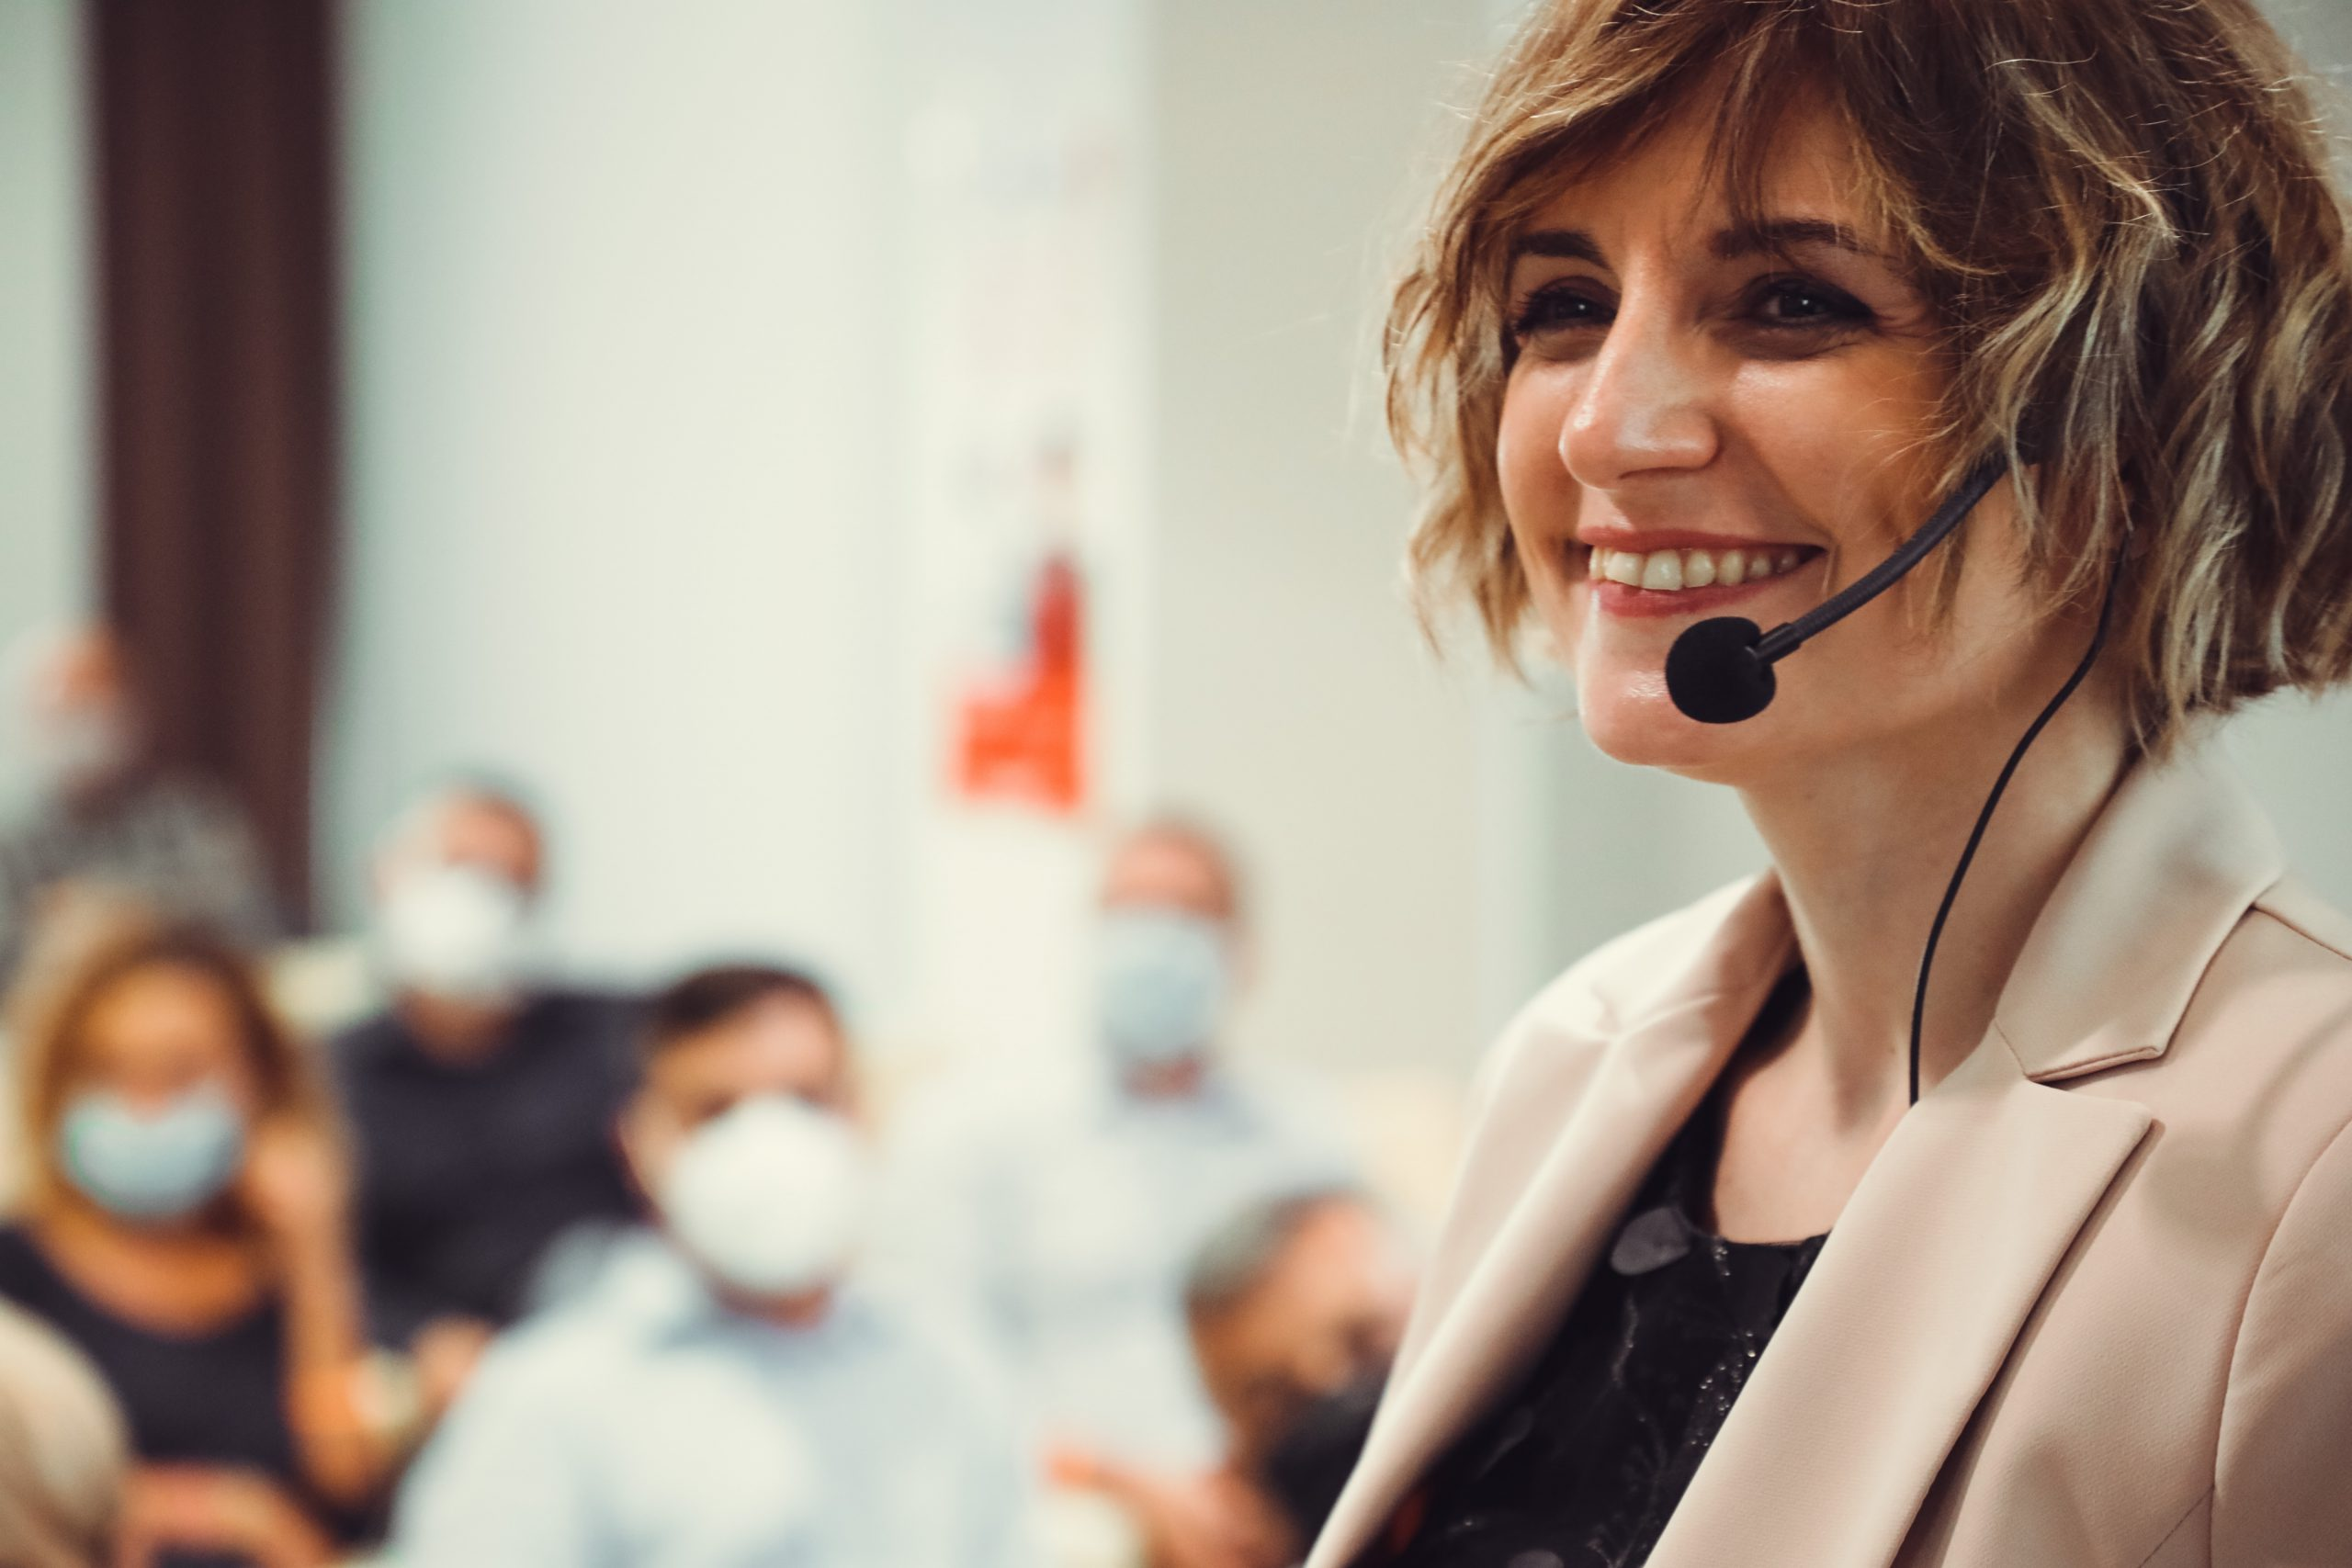 Chiara Alzati - Public Speaking